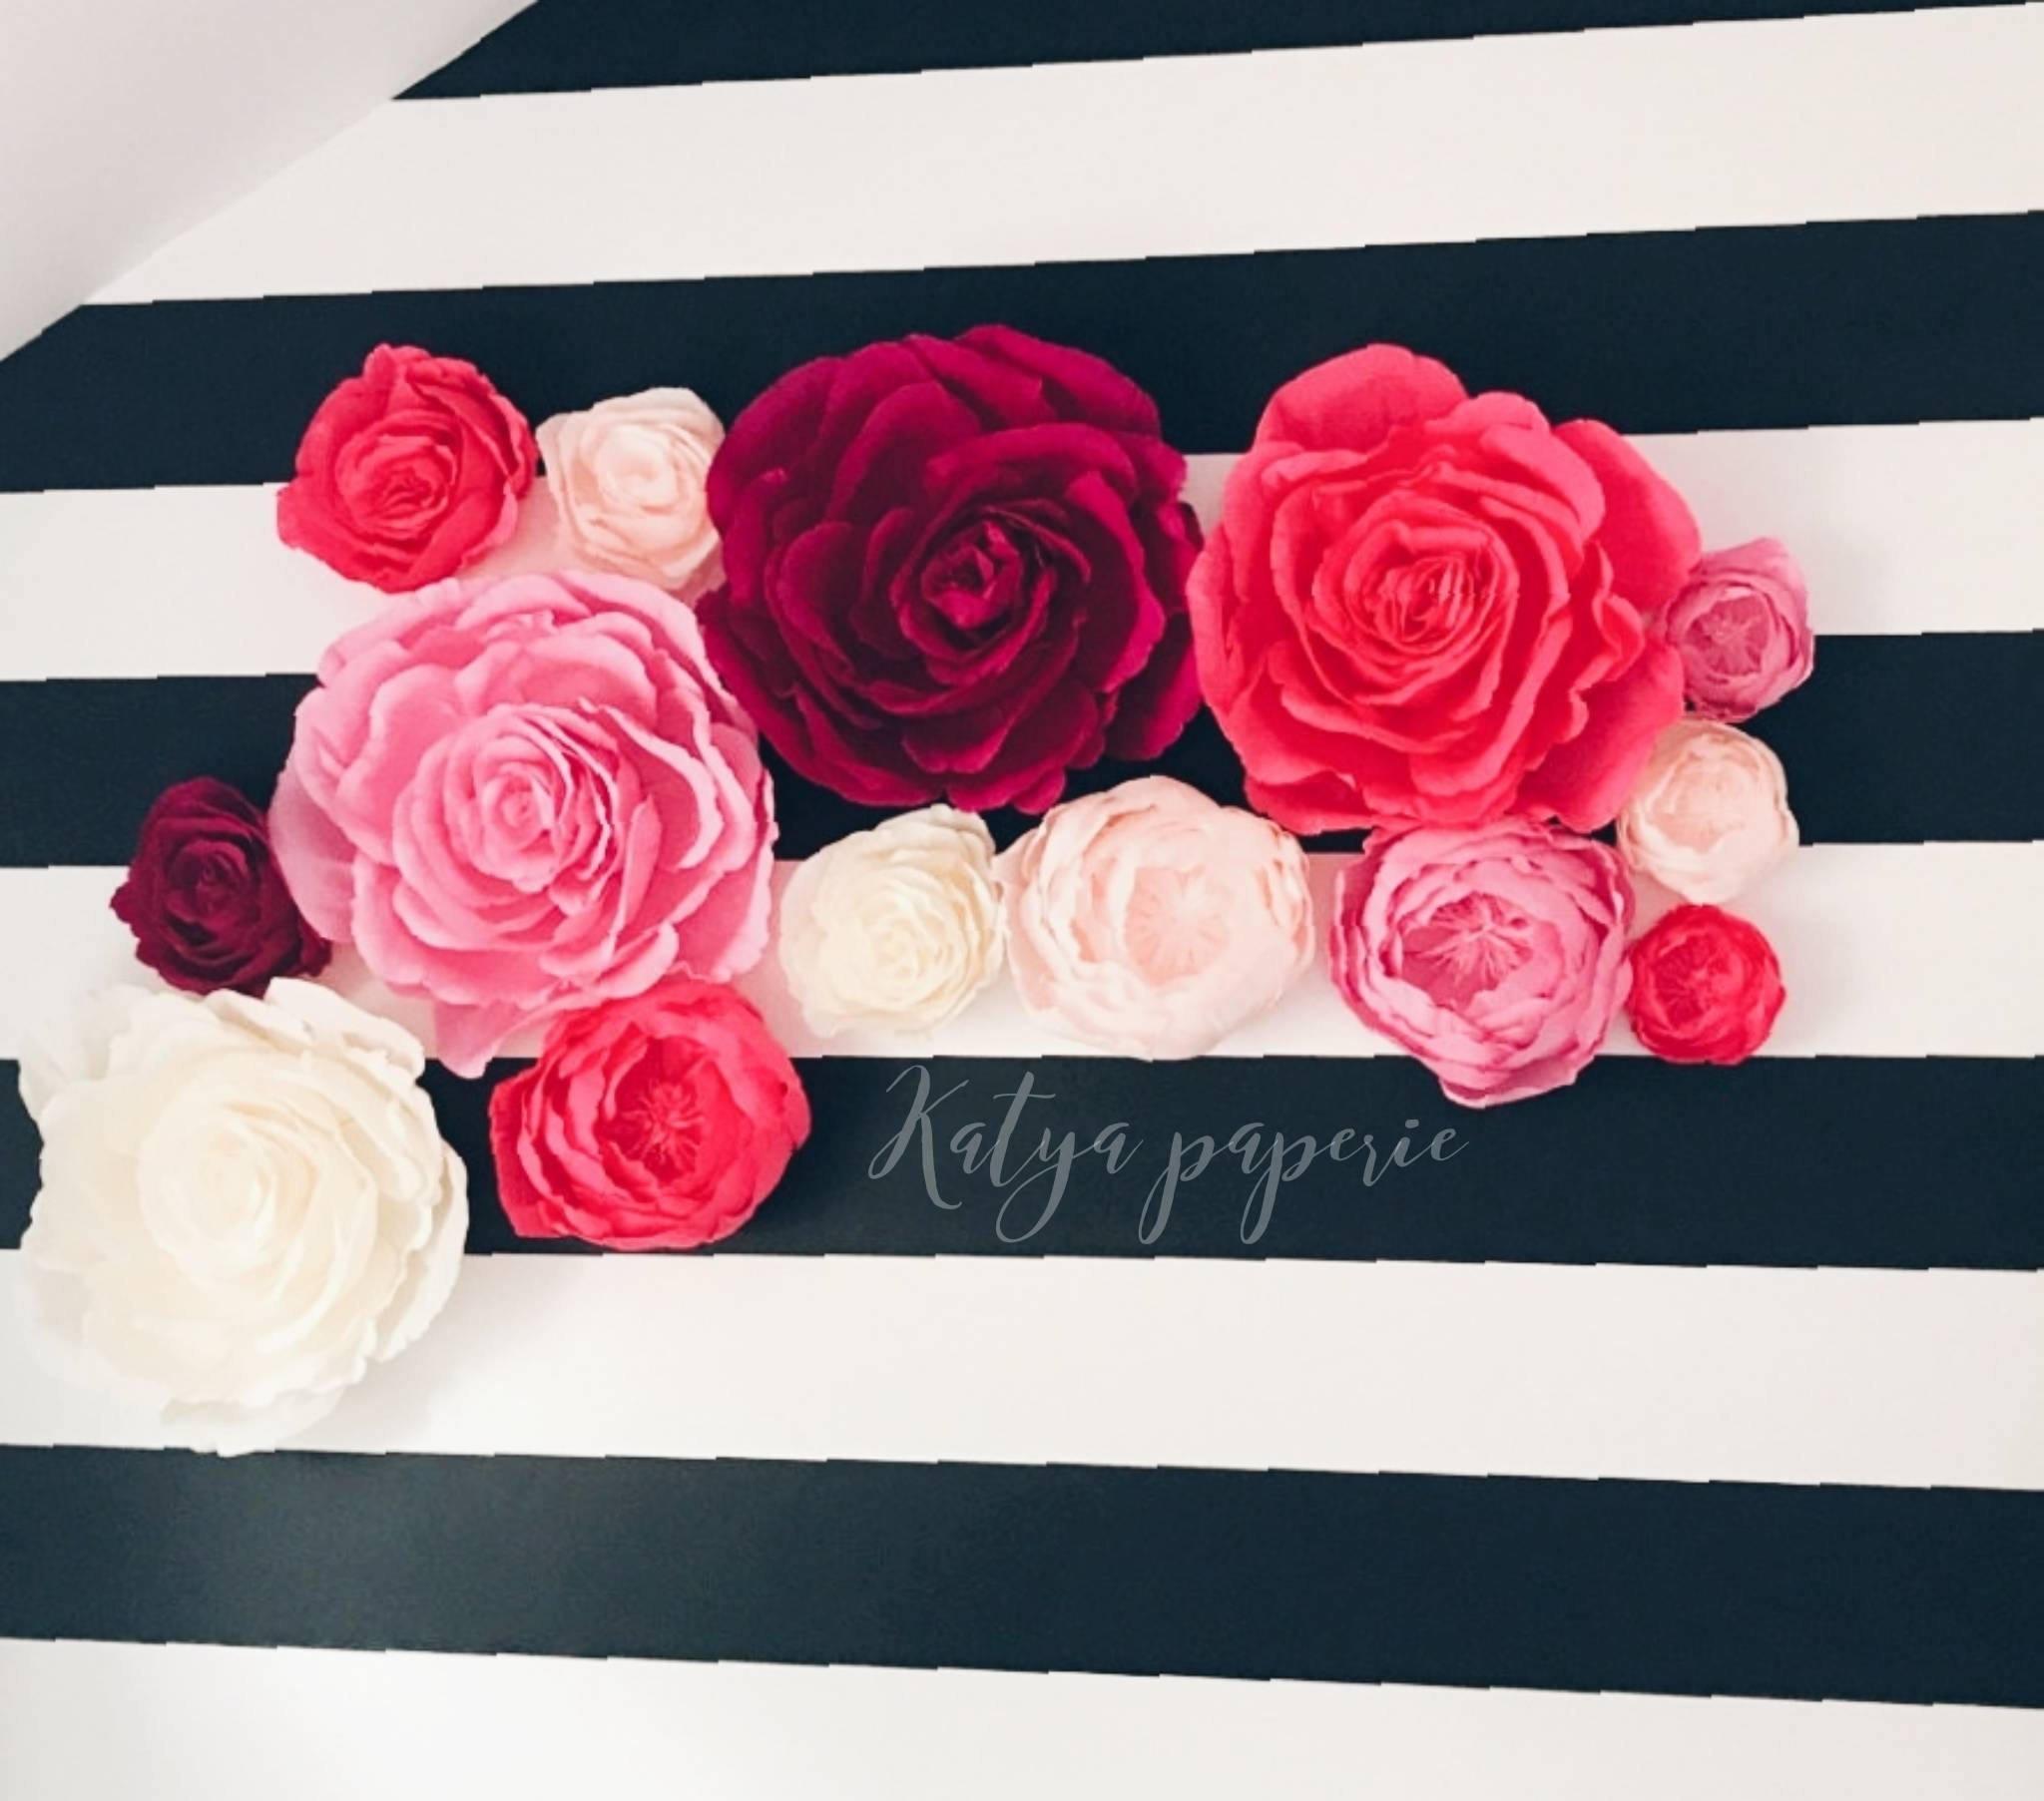 Chic nursery wall paper flowers. Paper flower wall display. Shop window crepe paper flowers. Alice in Wonderland garden party decor